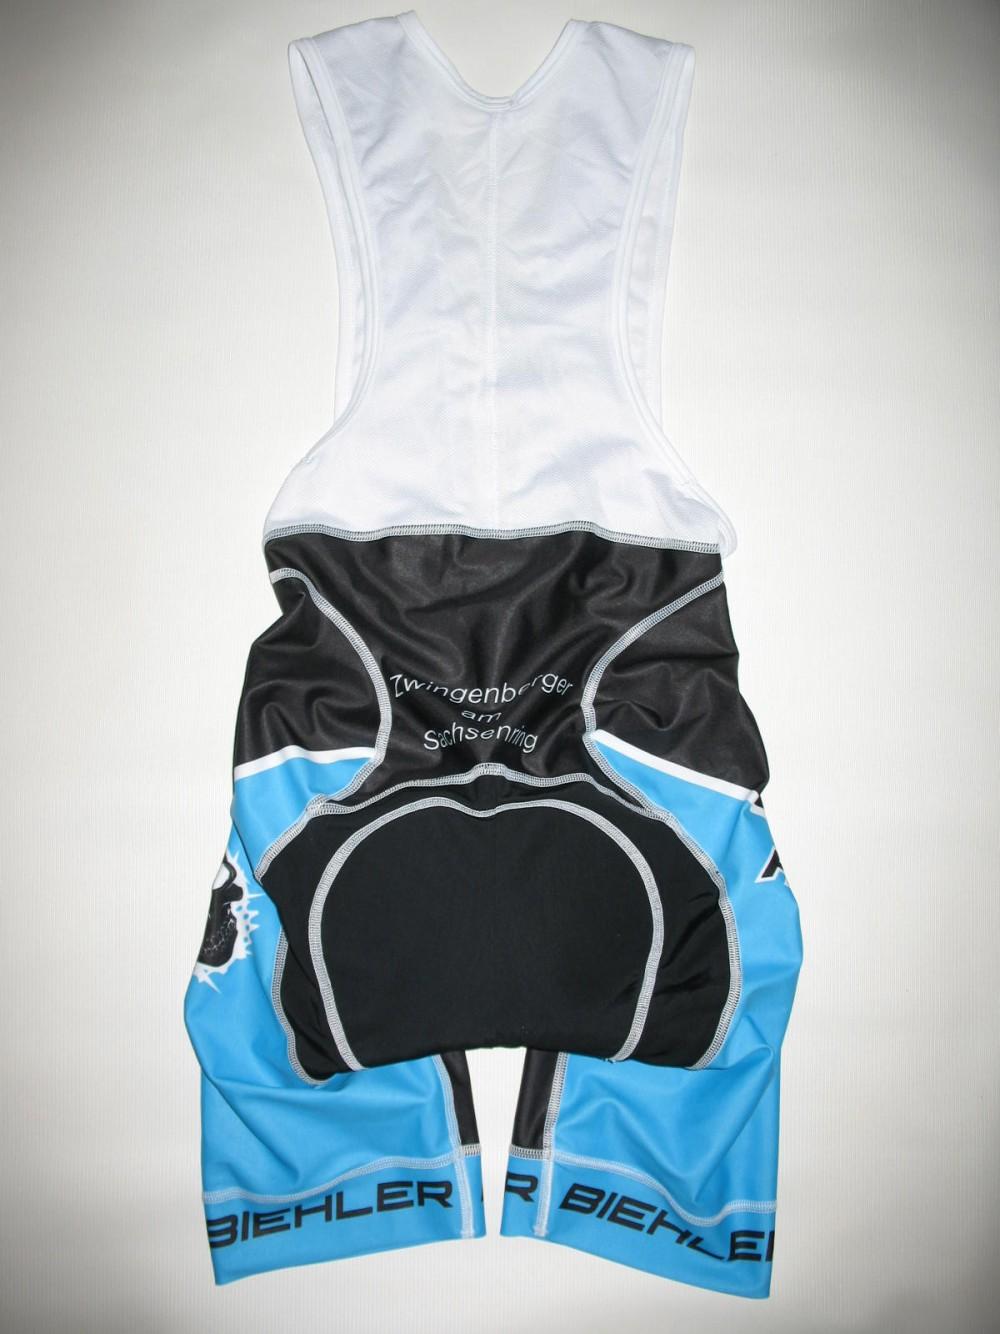 Велошорты BIEHLER heavy gear bib cycling shorts (размер S) - 2